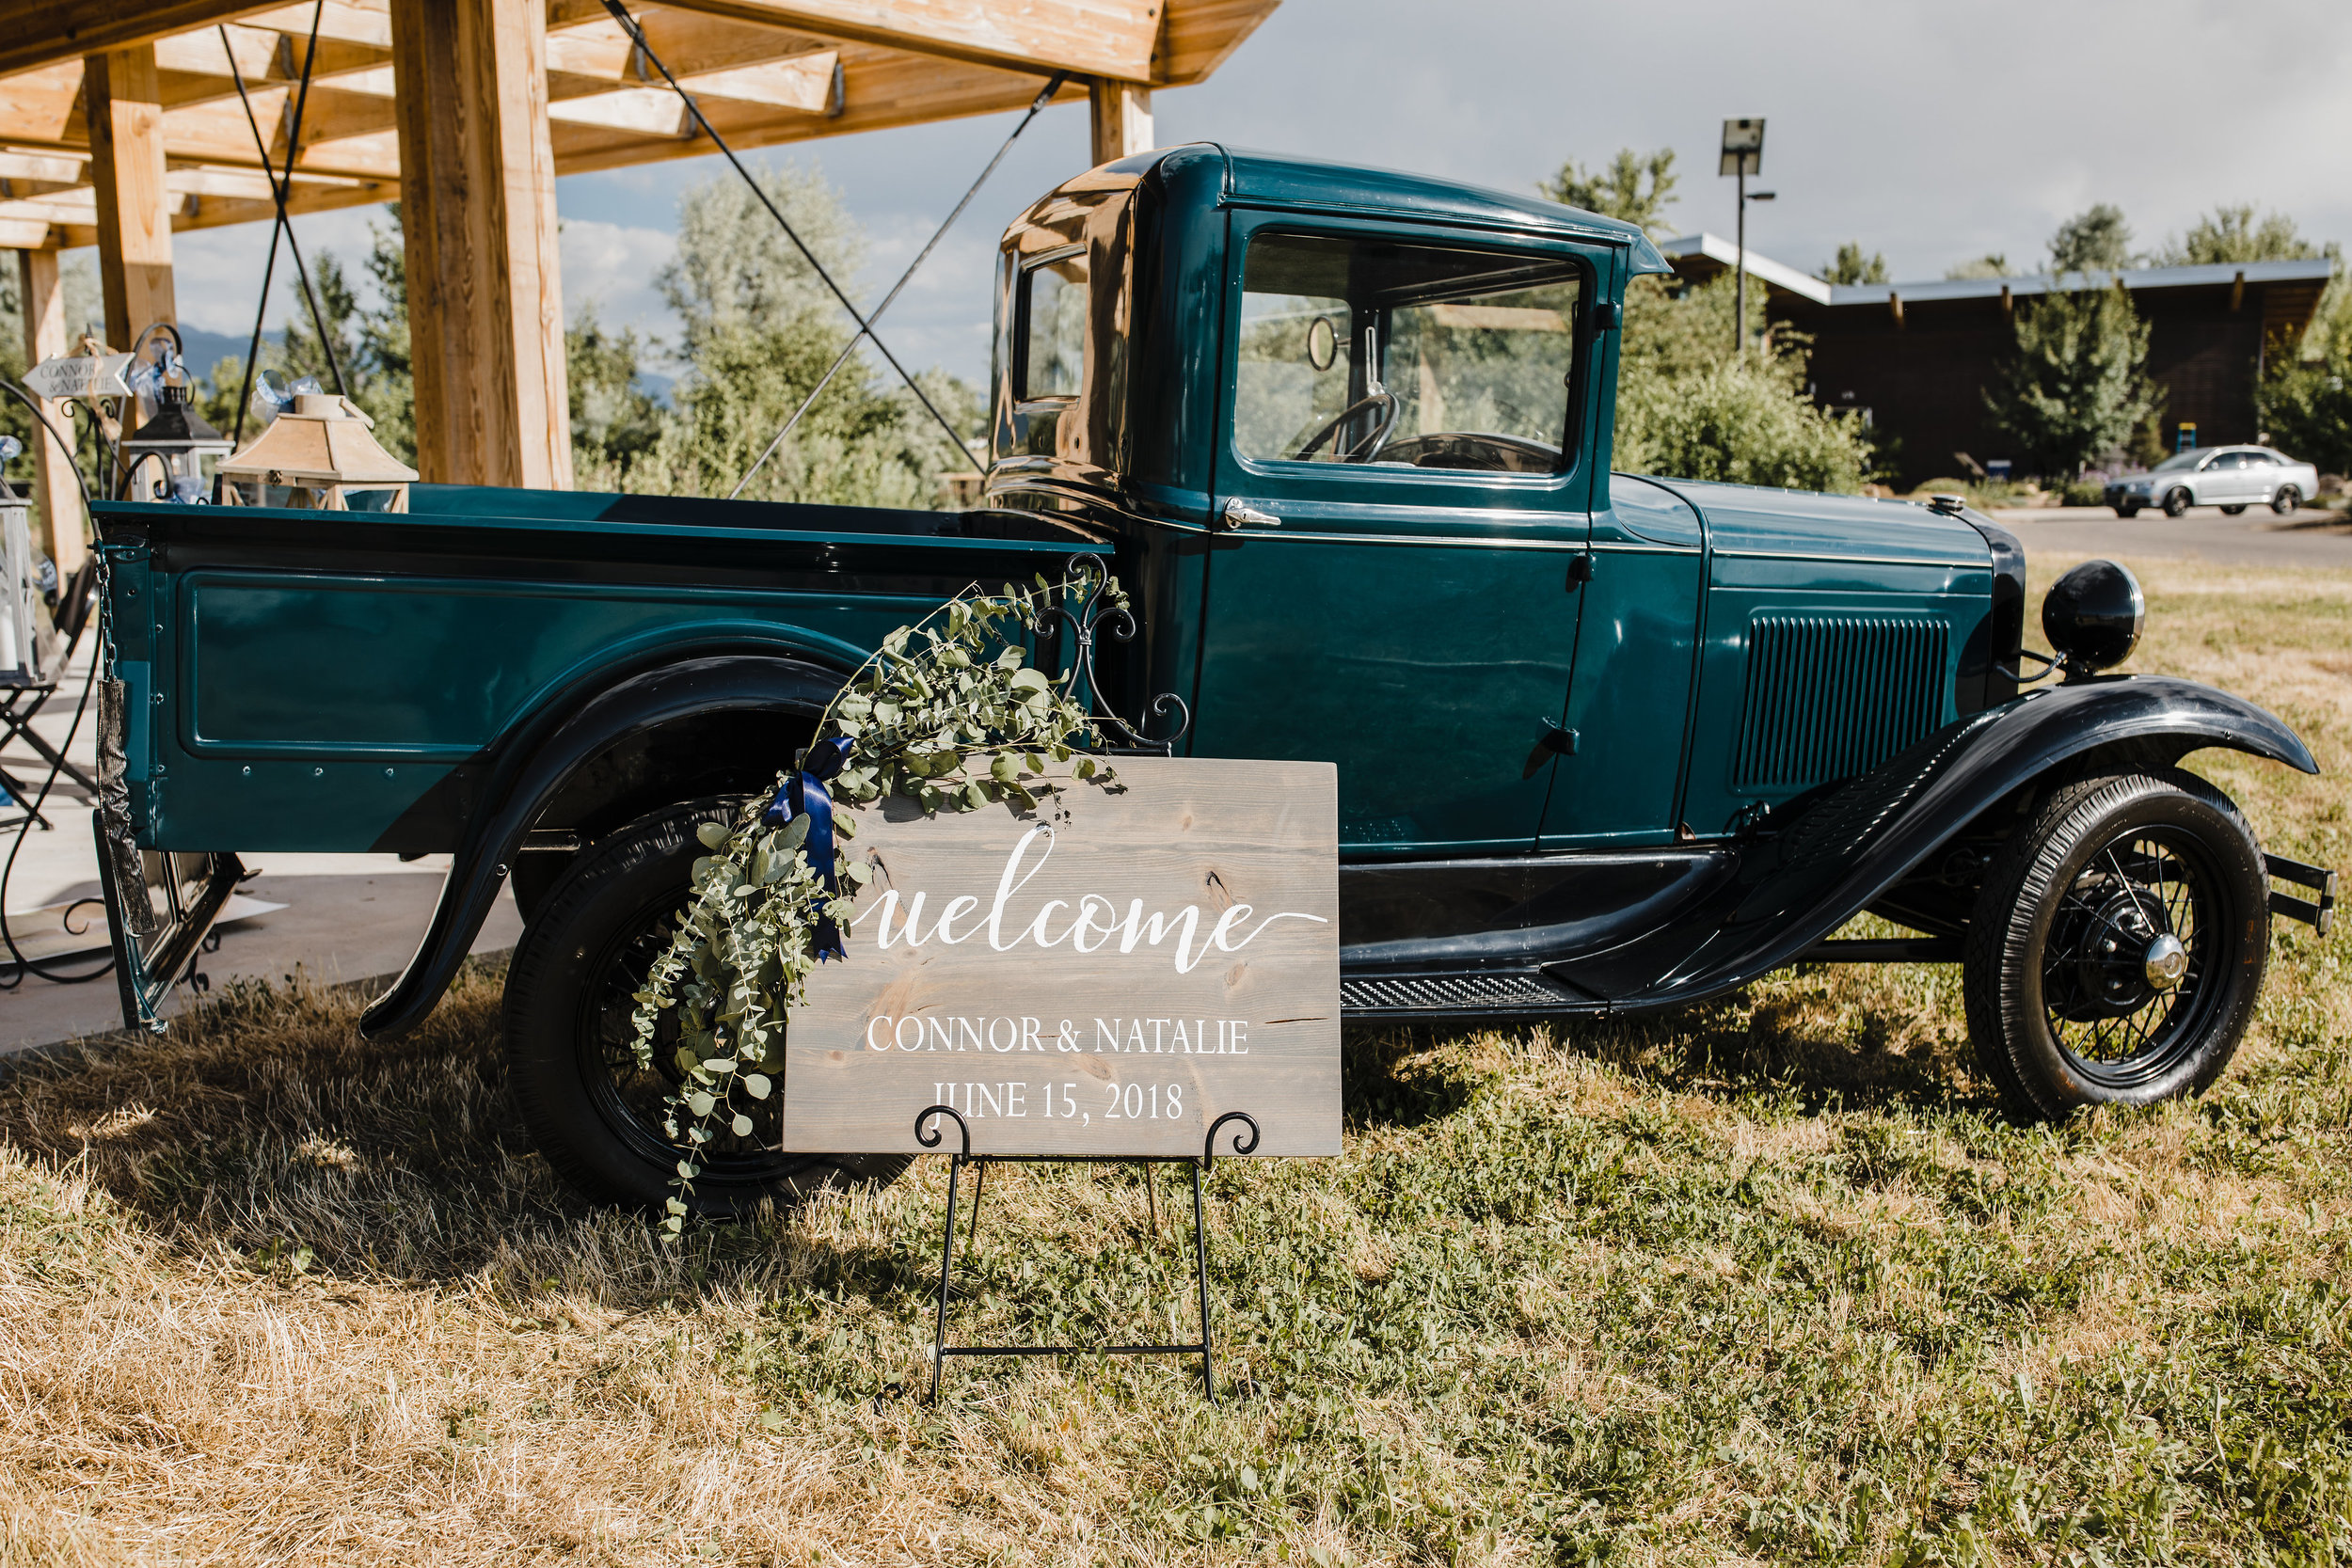 salt lake city professional wedding photographer welcome reception sign rustic vintage car